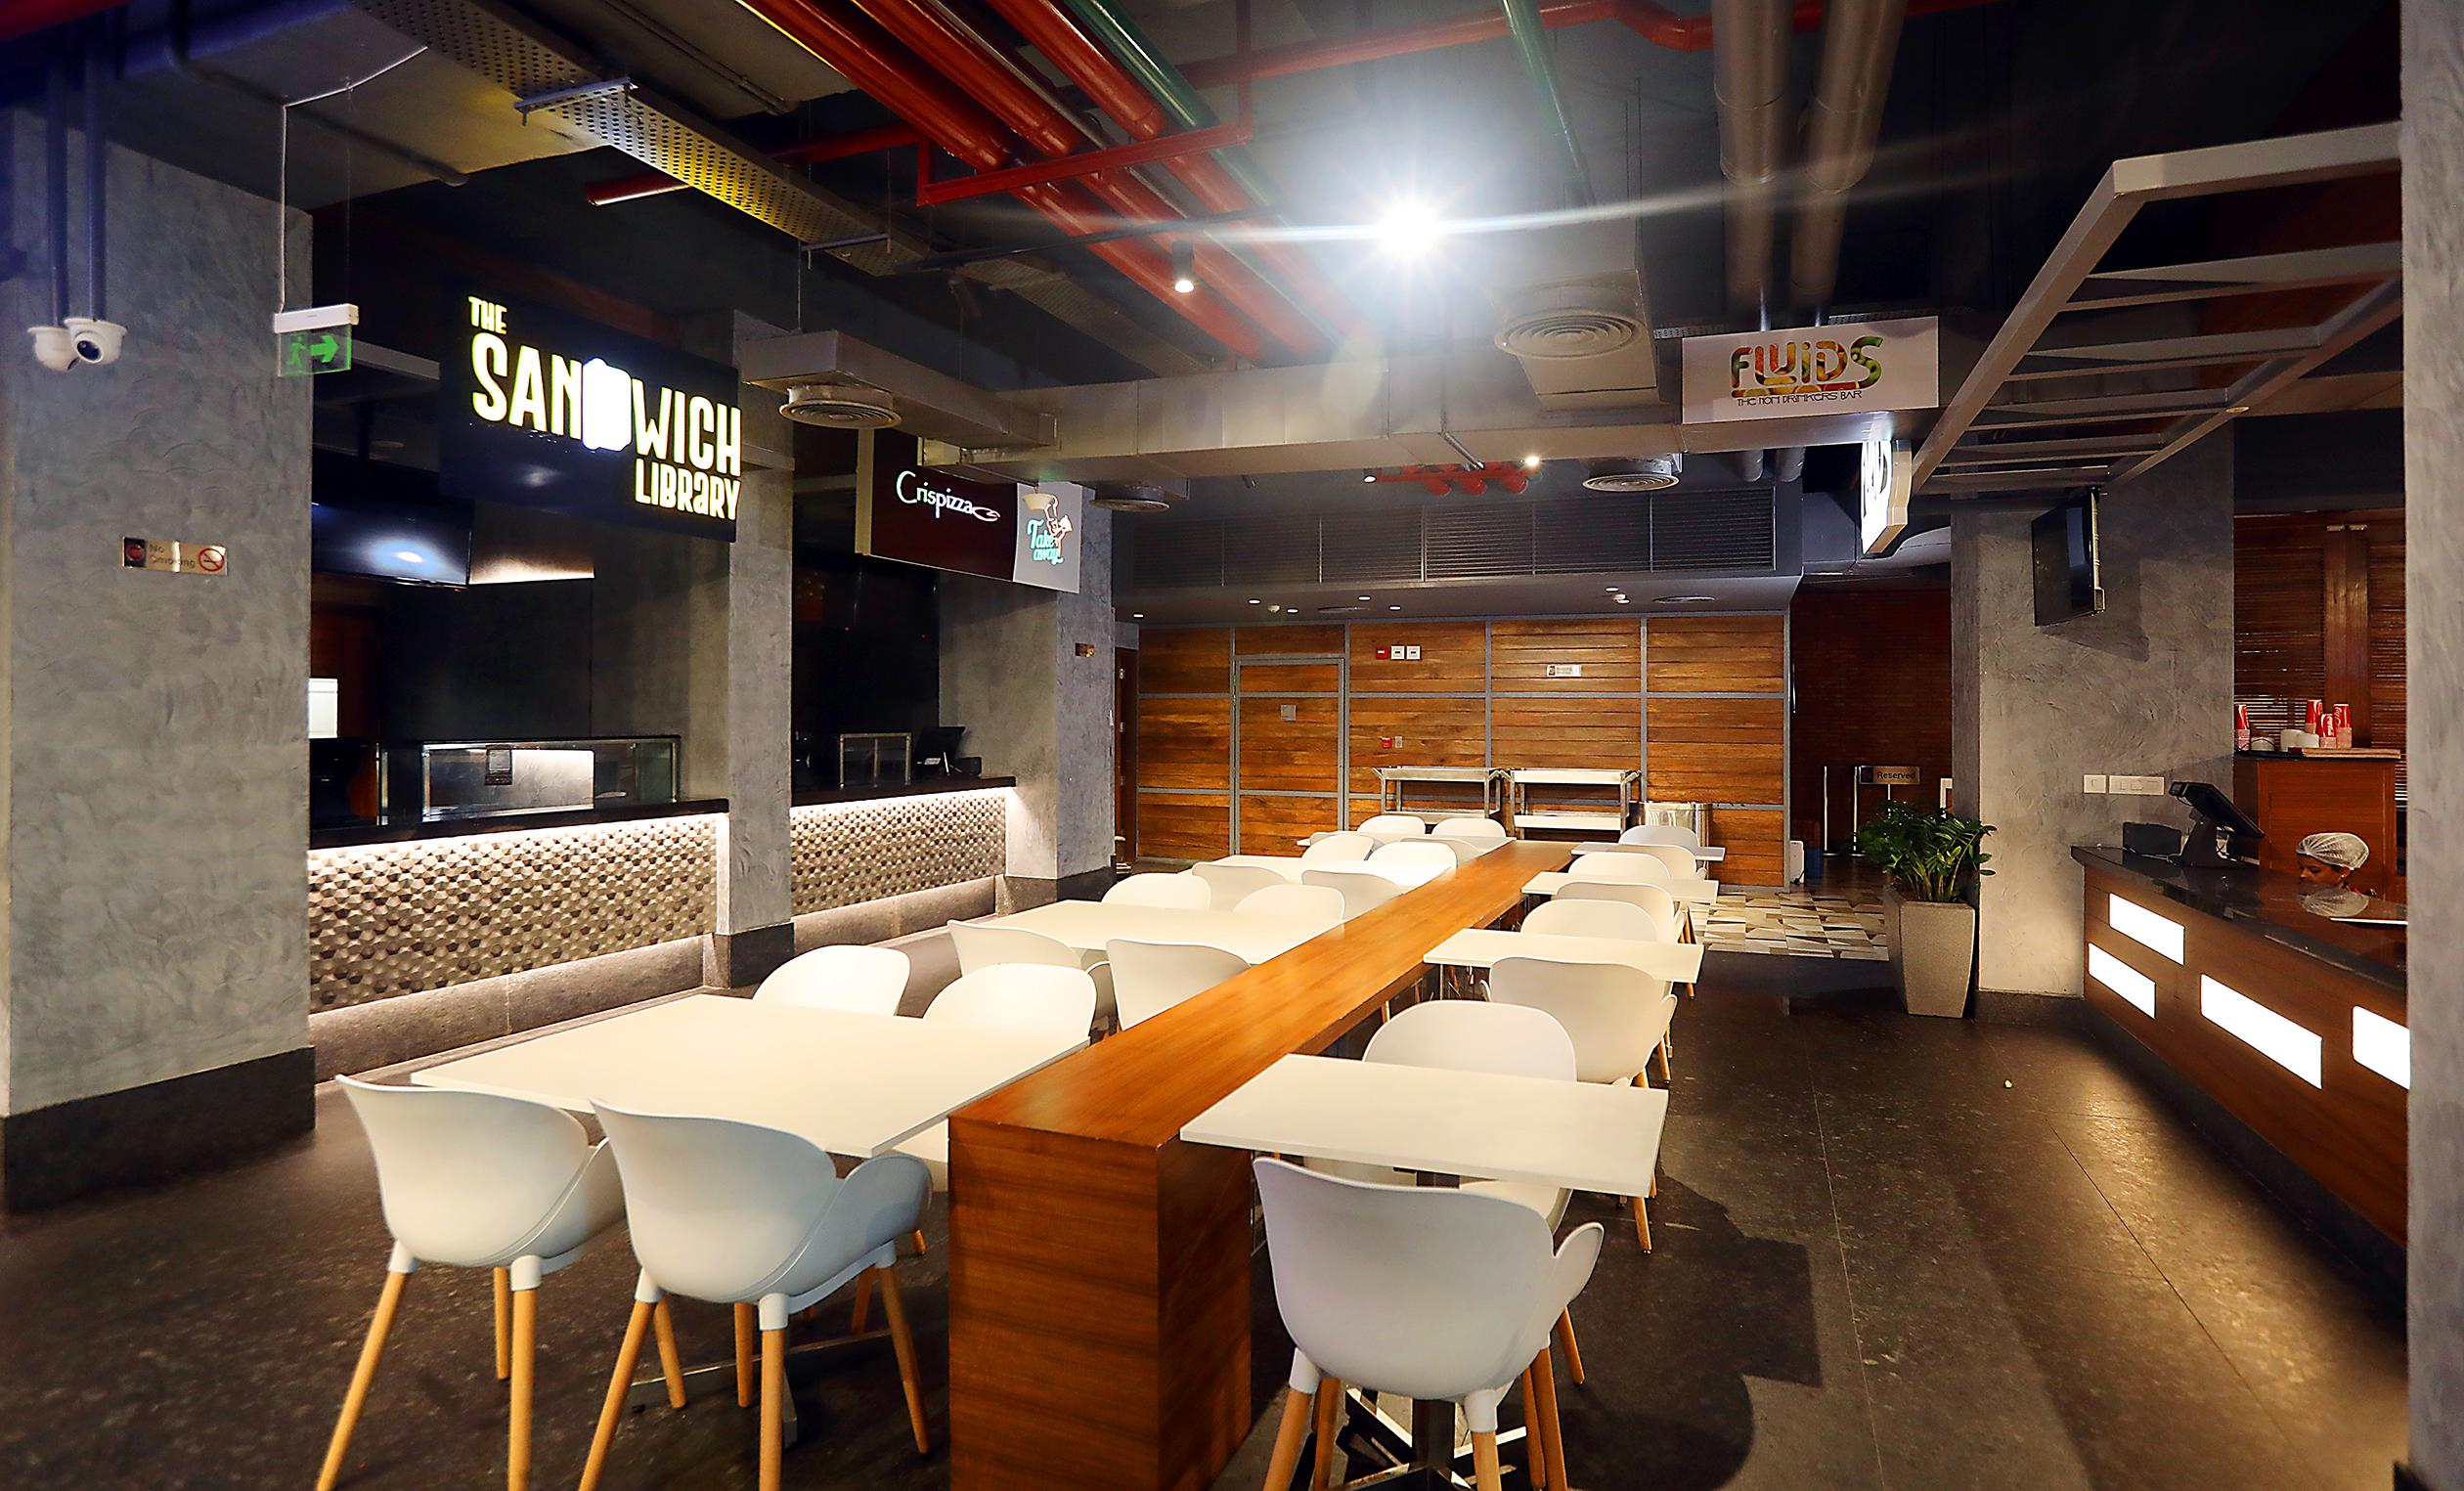 Candor Food Court